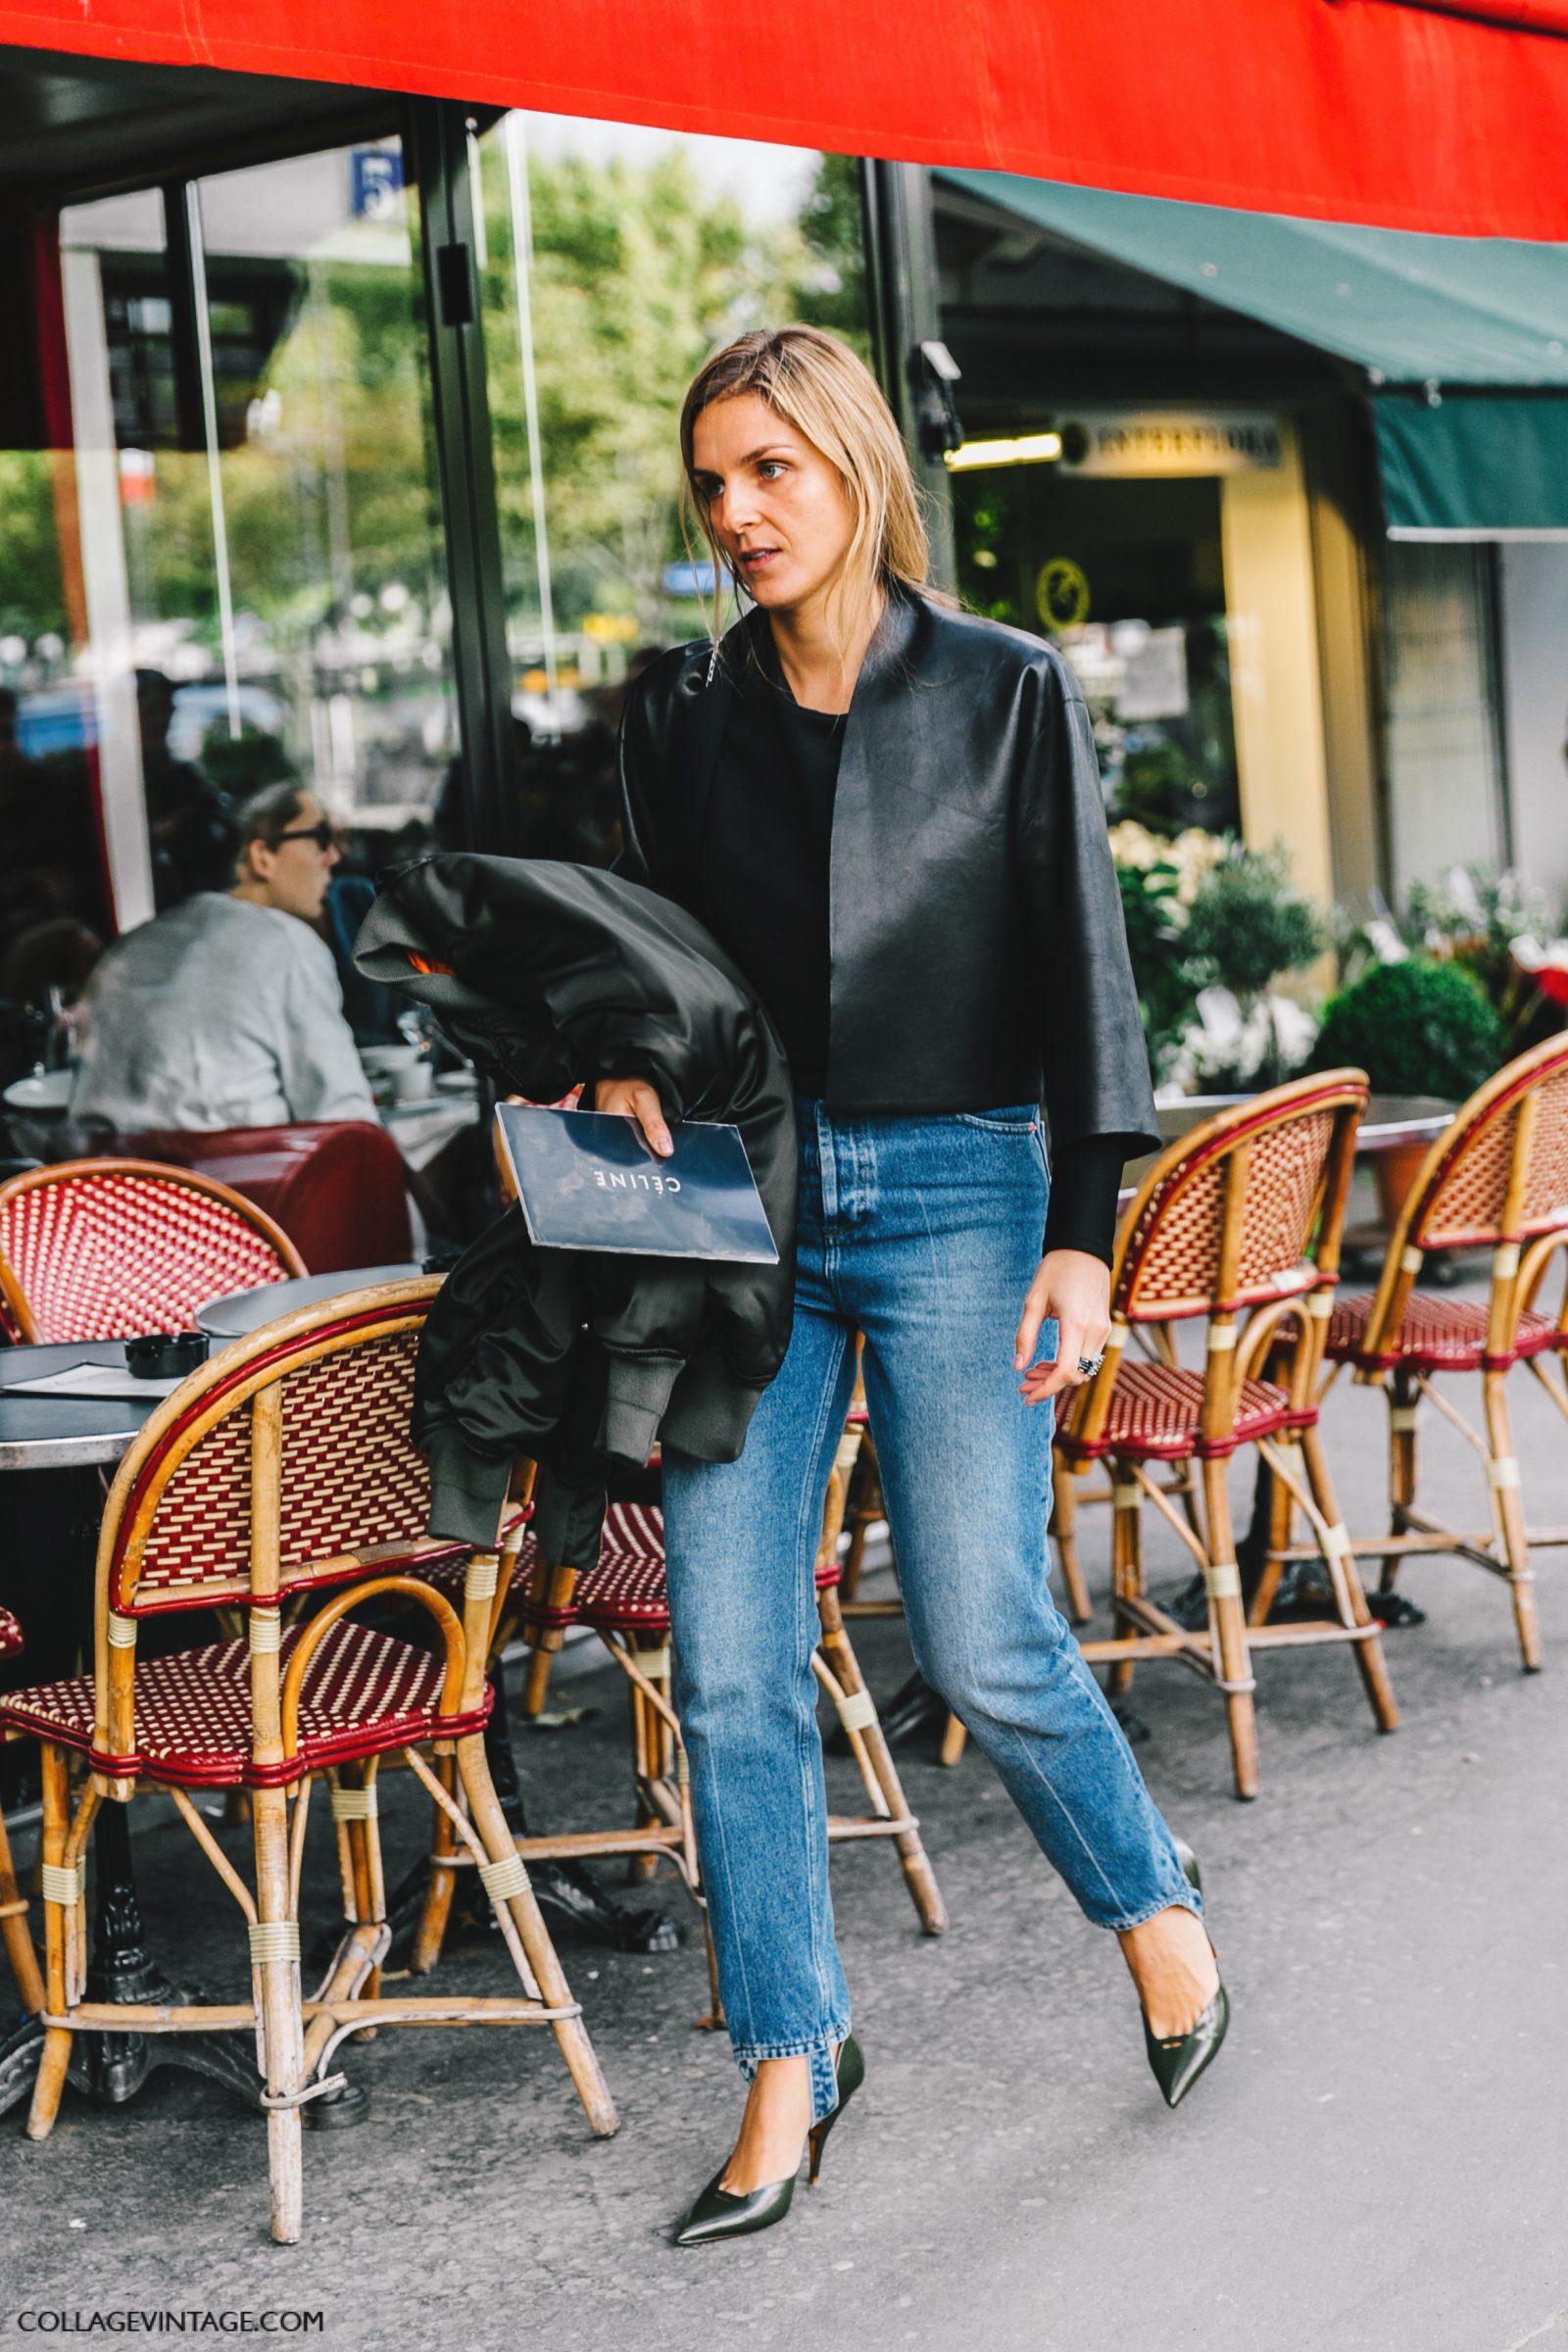 pfw-paris_fashion_week_ss17-street_style-outfits-collage_vintage-valentino-balenciaga-celine-93